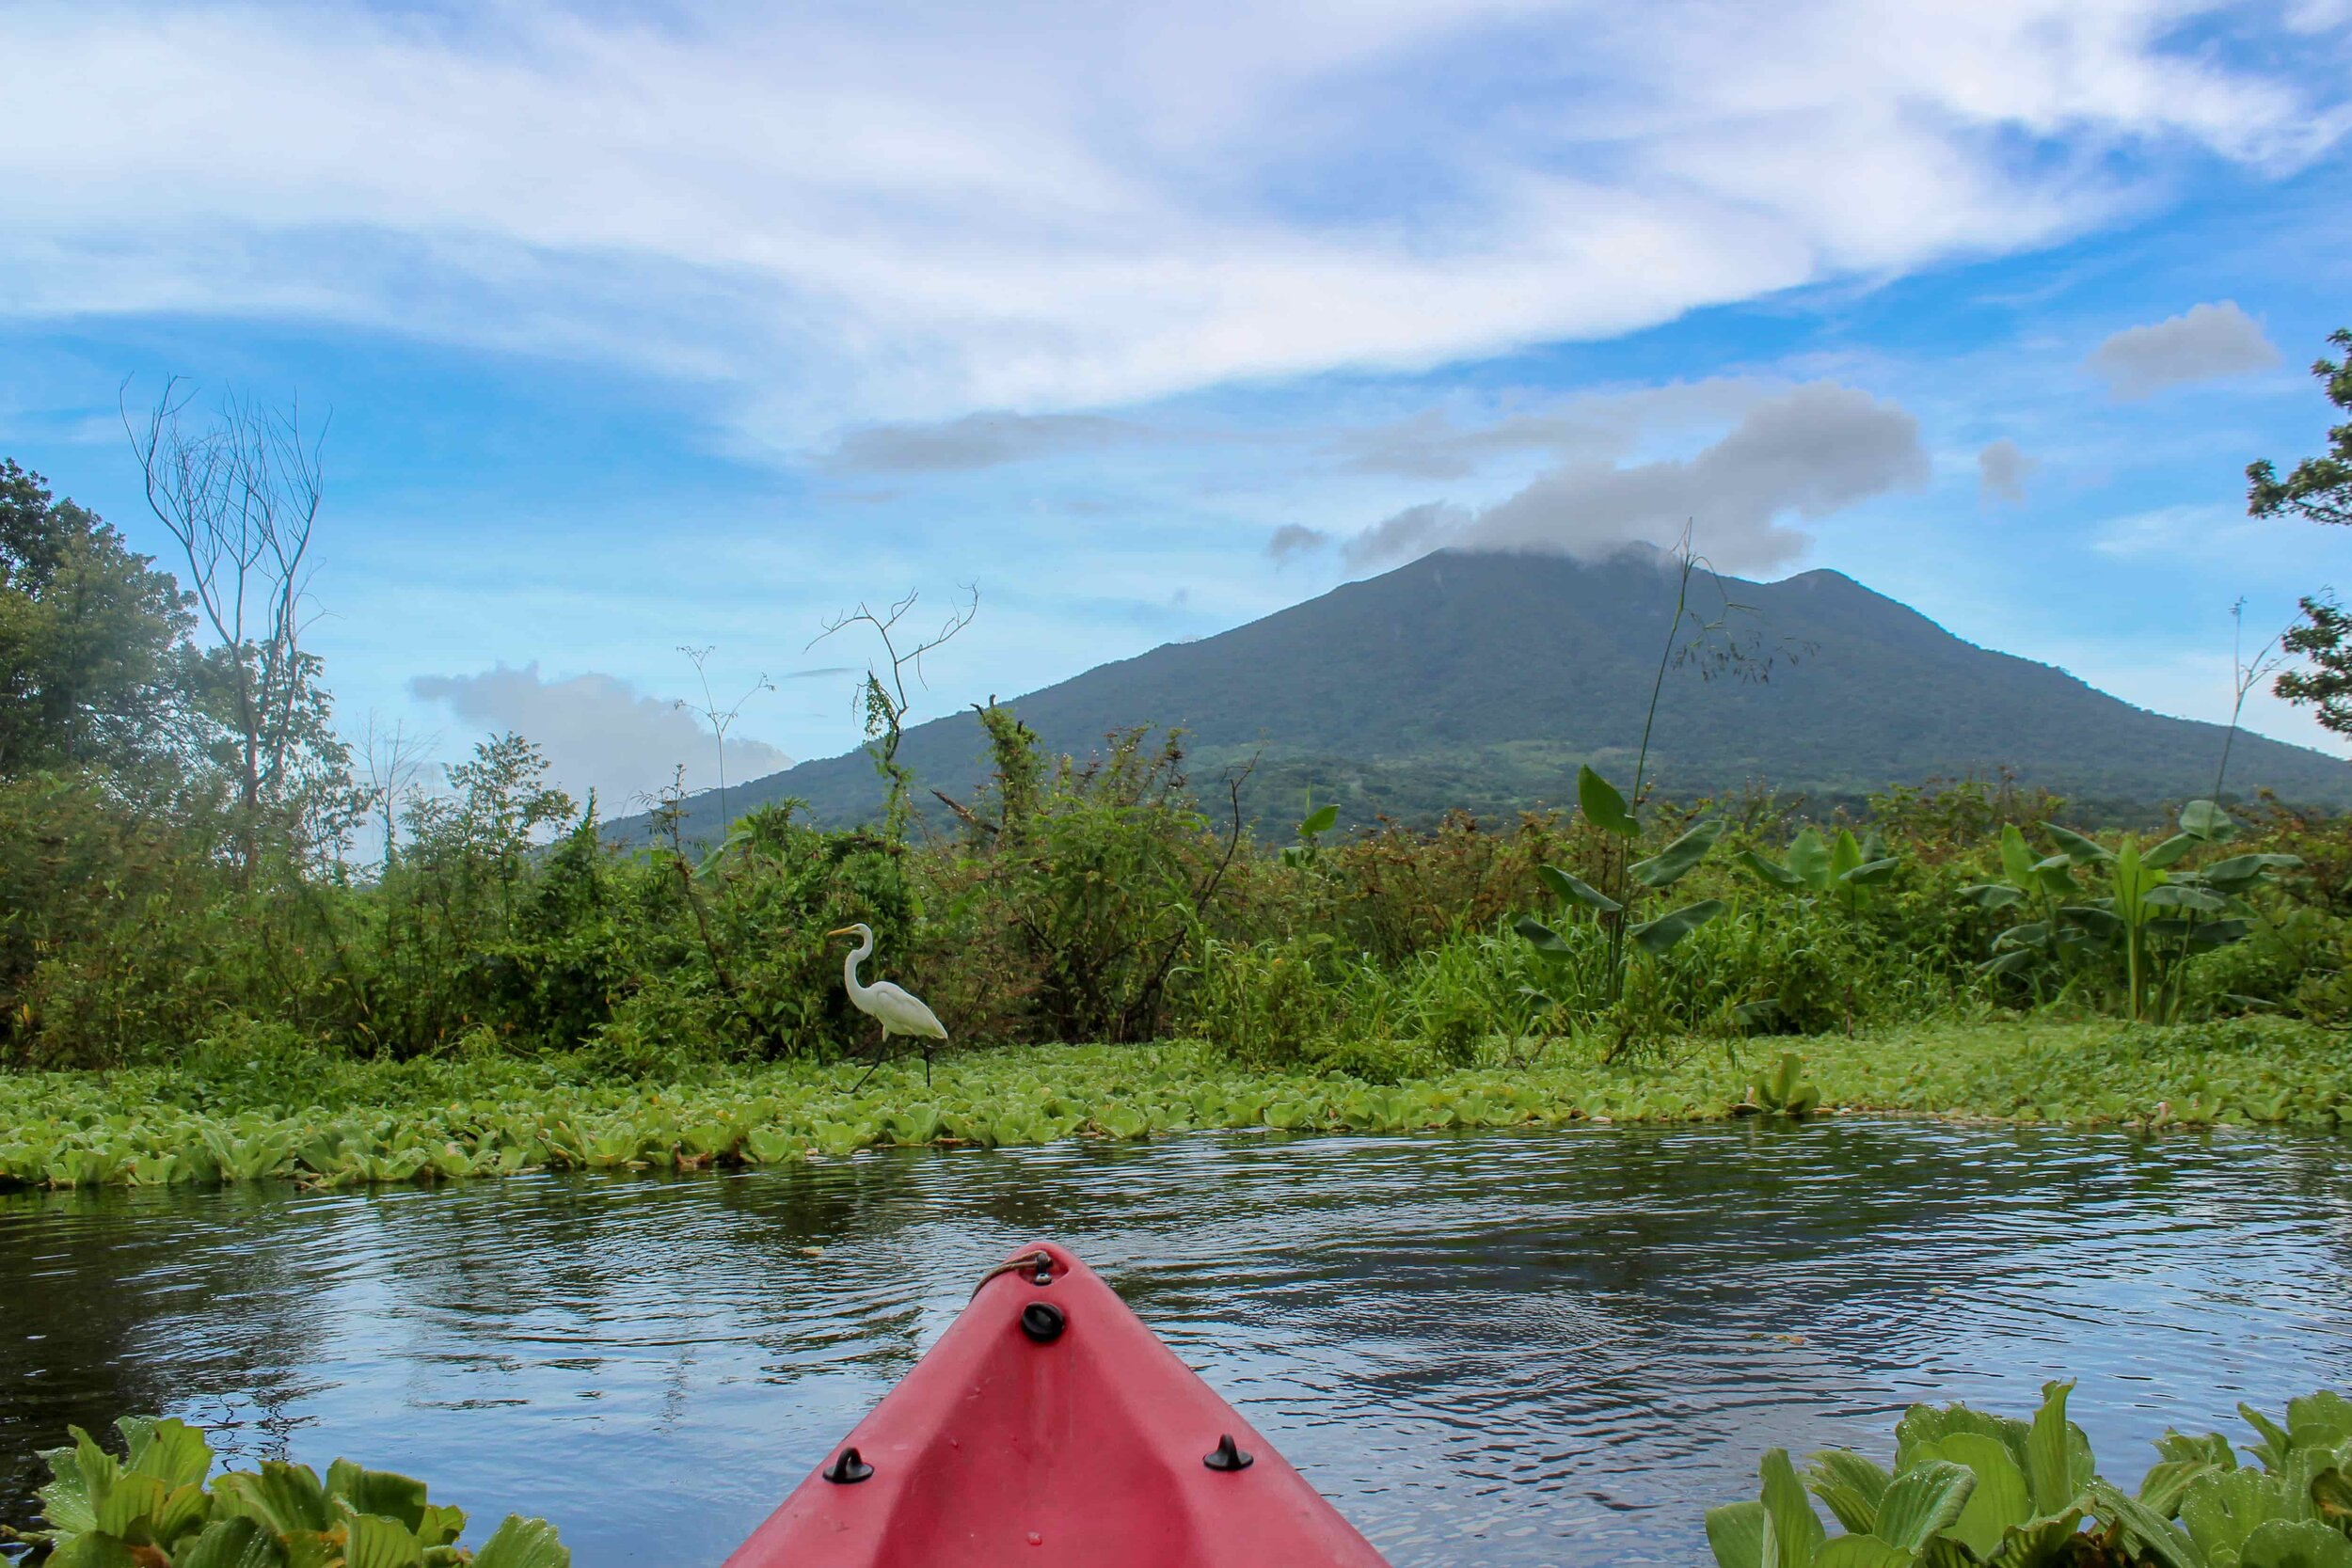 kayaking the istian, looking at Maderas, Ometepe (Lake Cocibolca)